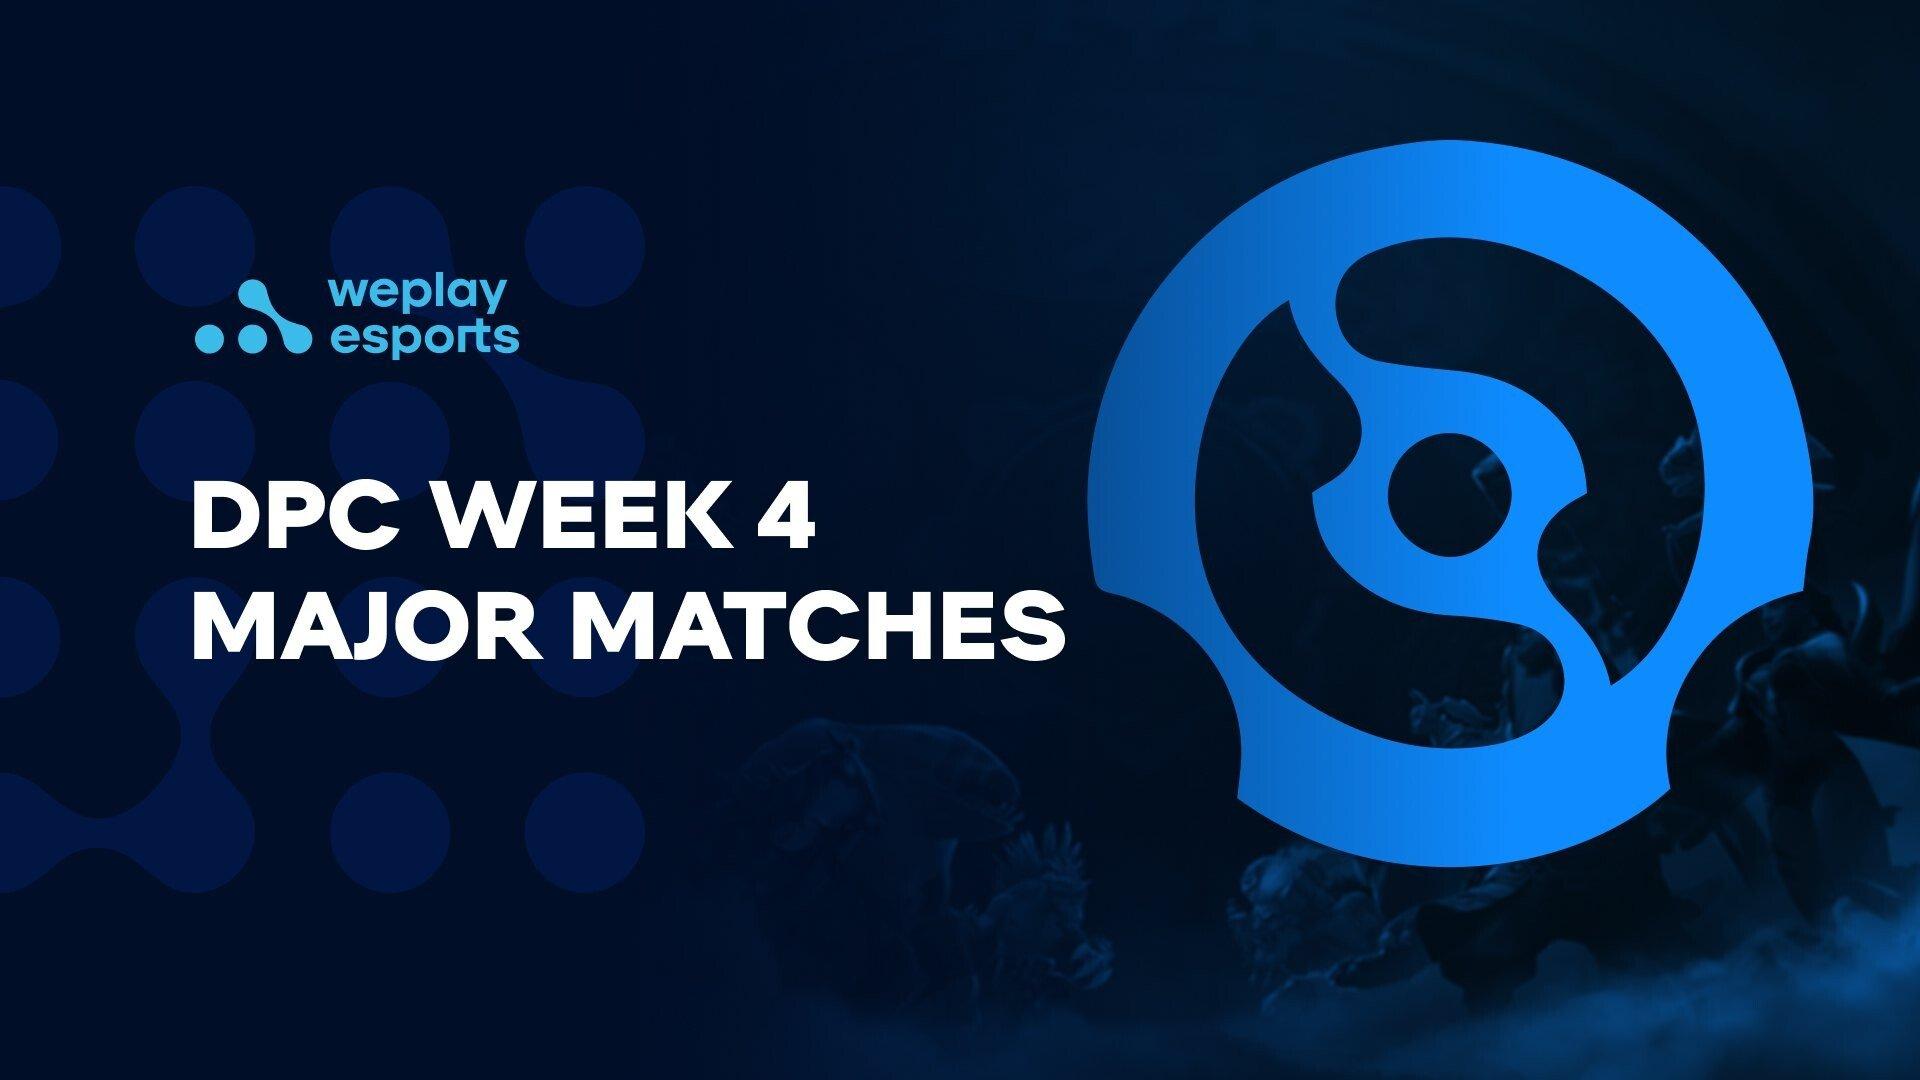 Five DPC Week 4 Major Matches